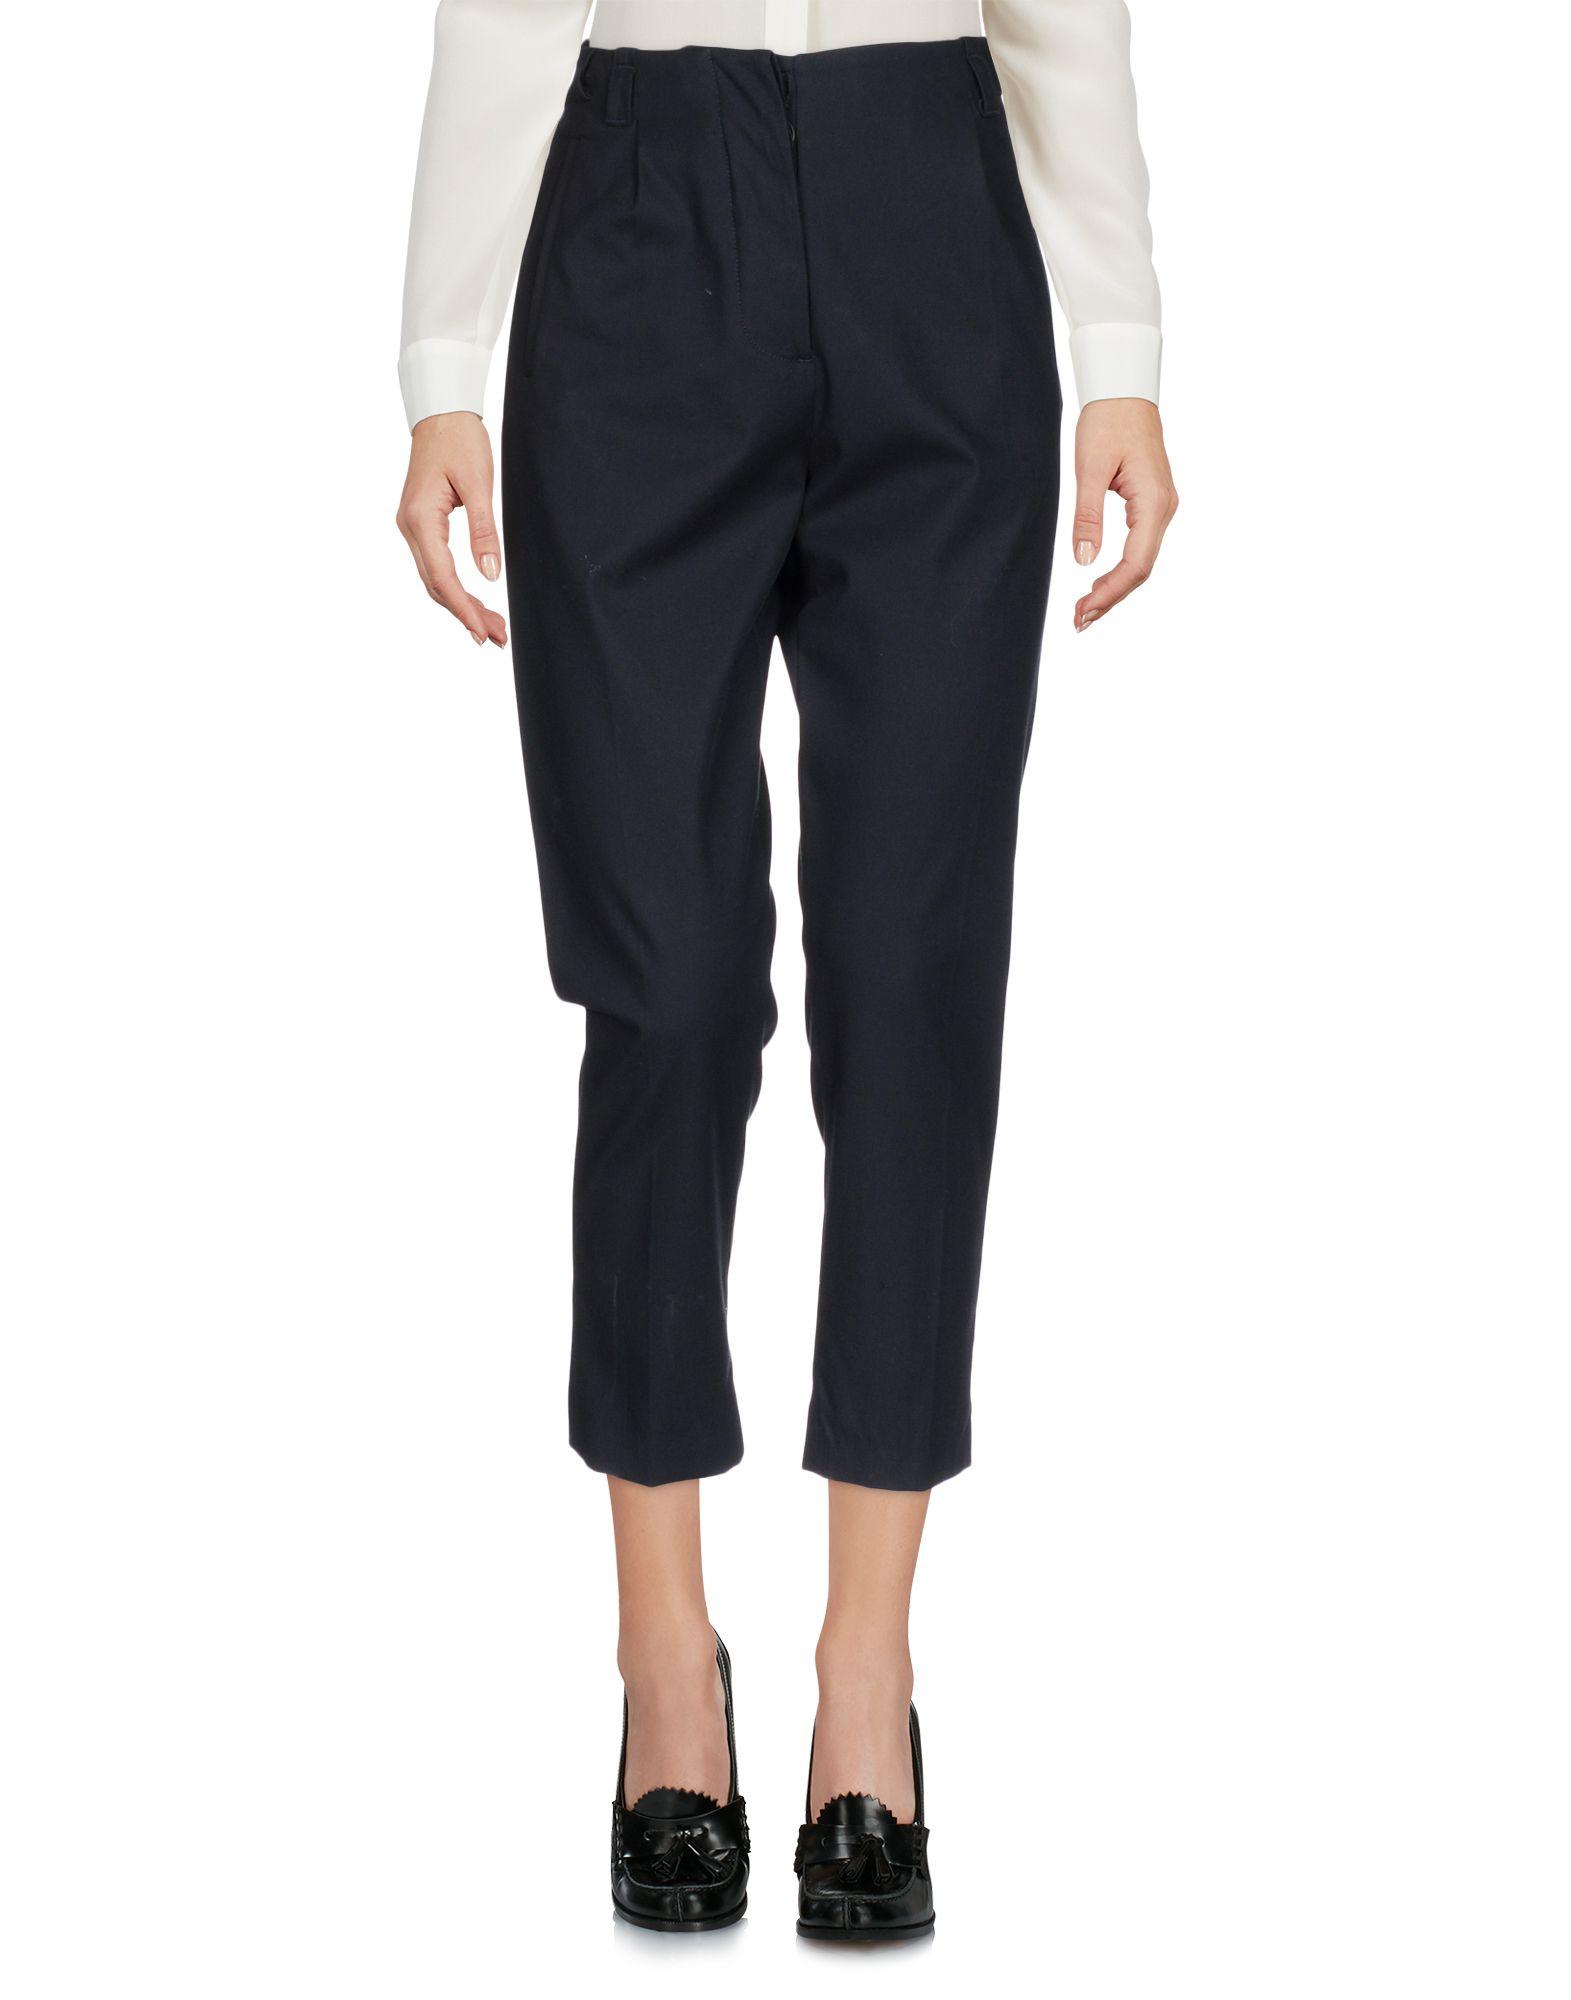 Pantalone Tela Donna - Acquista online su IFJ33Z